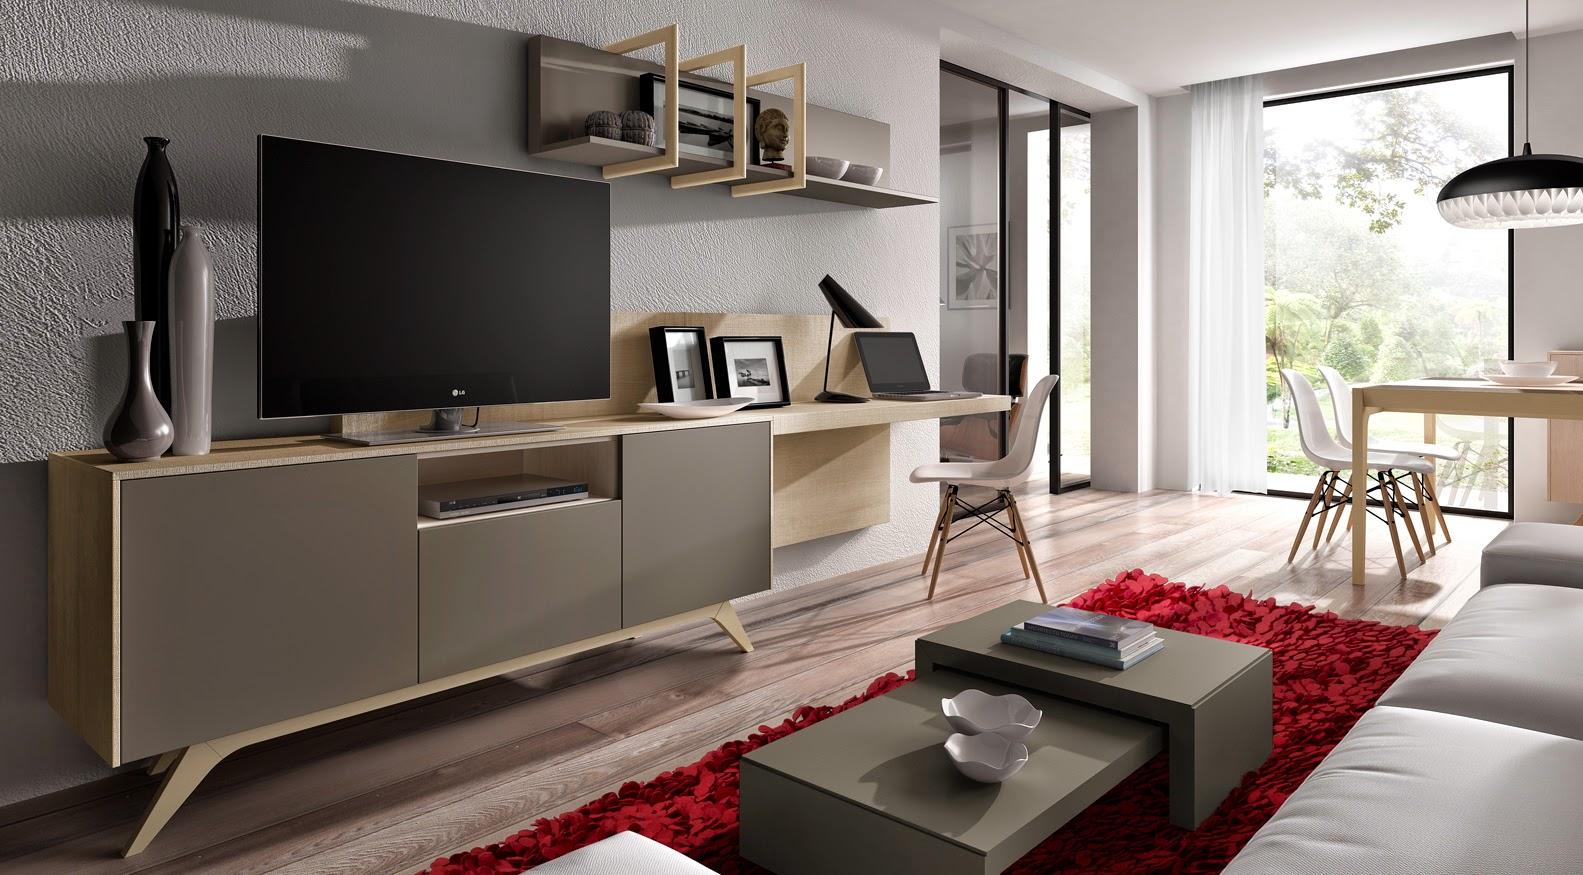 Arte h bitat tu tienda de muebles noviembre 2014 for Piferrer muebles catalogo